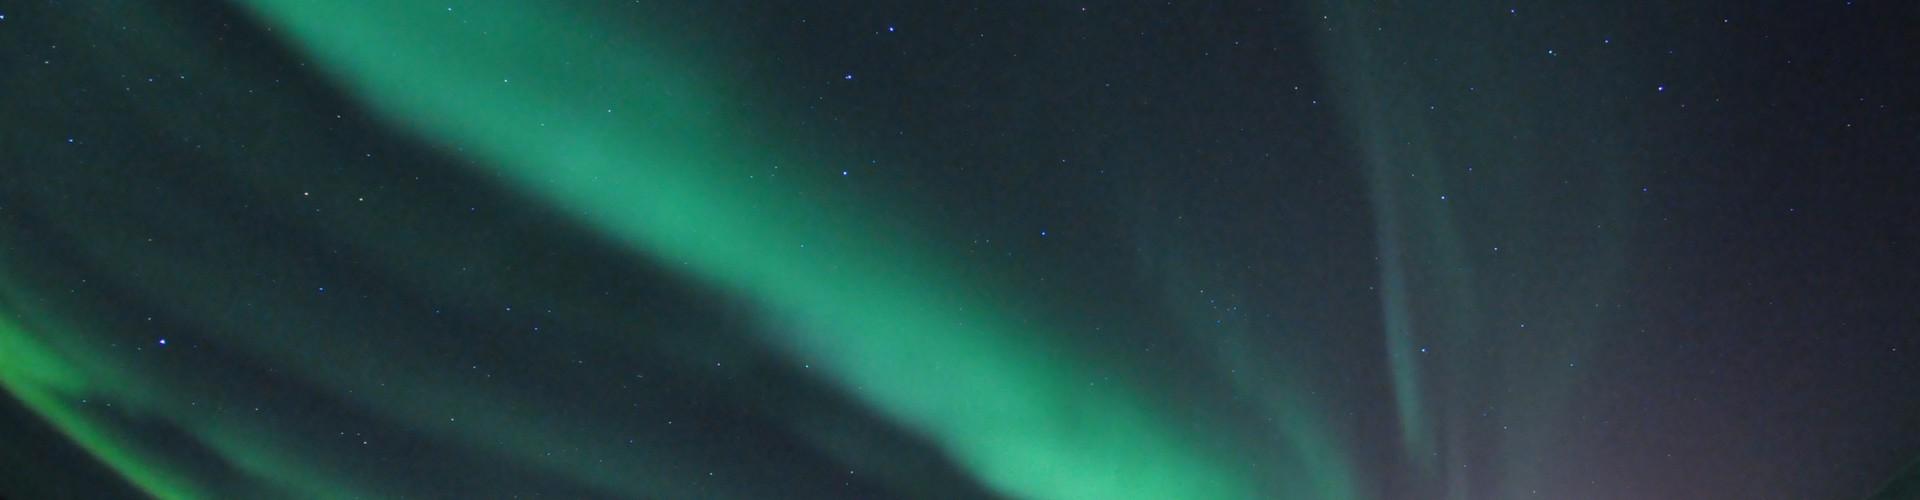 Picturing the Northern Lights. (Credit: Taro Nakai, distributed via imaggeo.egu.eu)